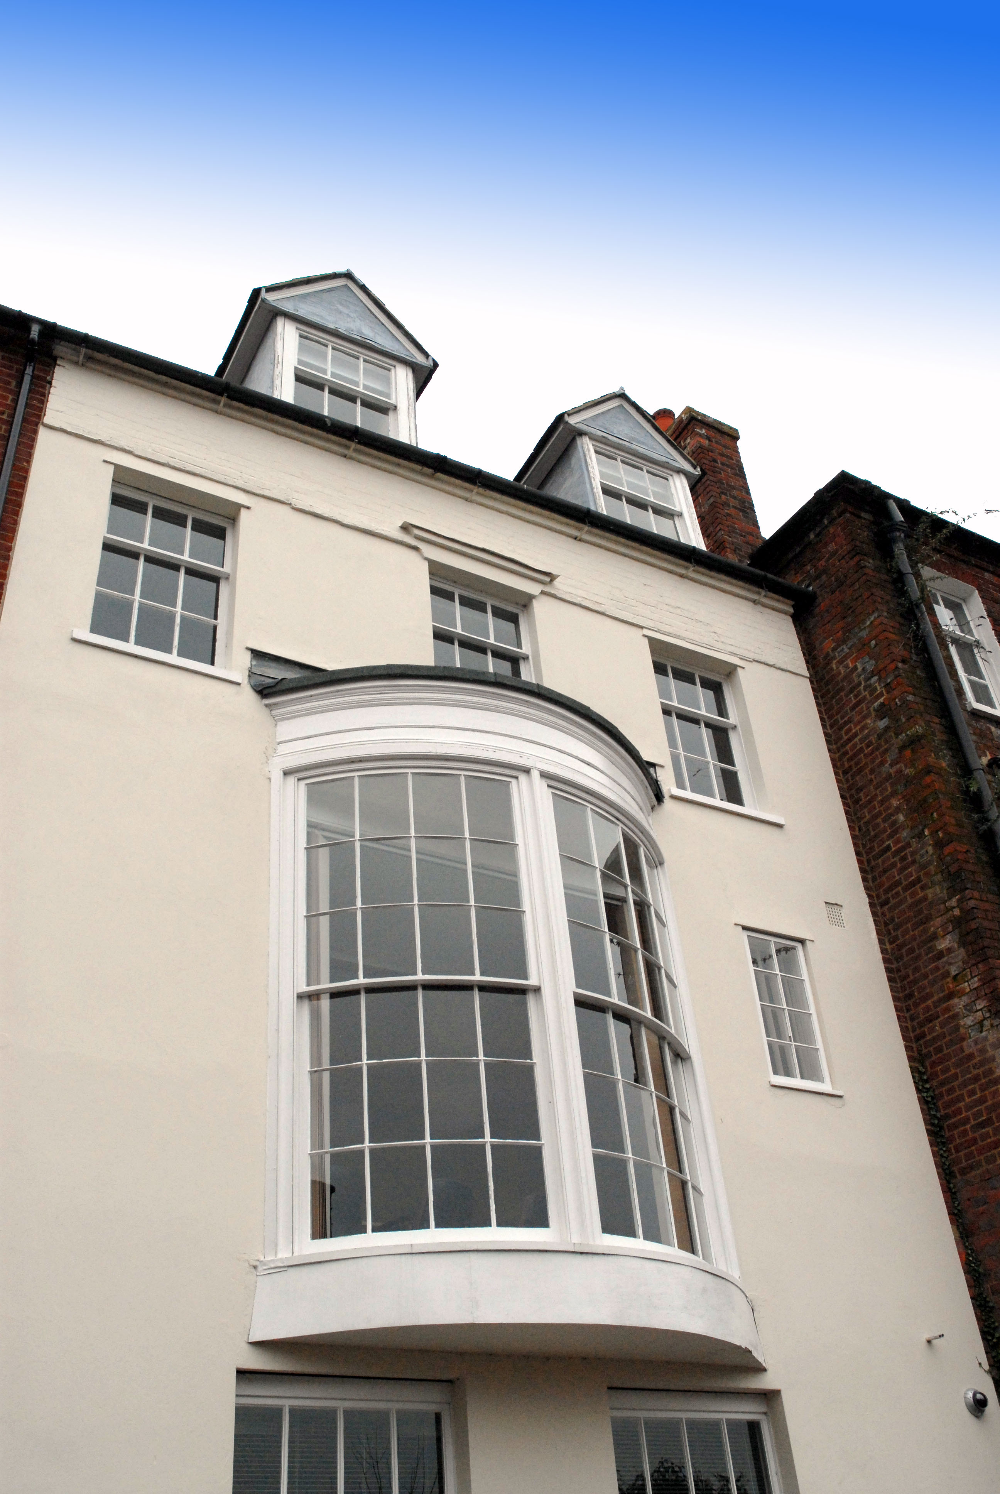 Festival House - Oxford Street, RG14 - Newbury